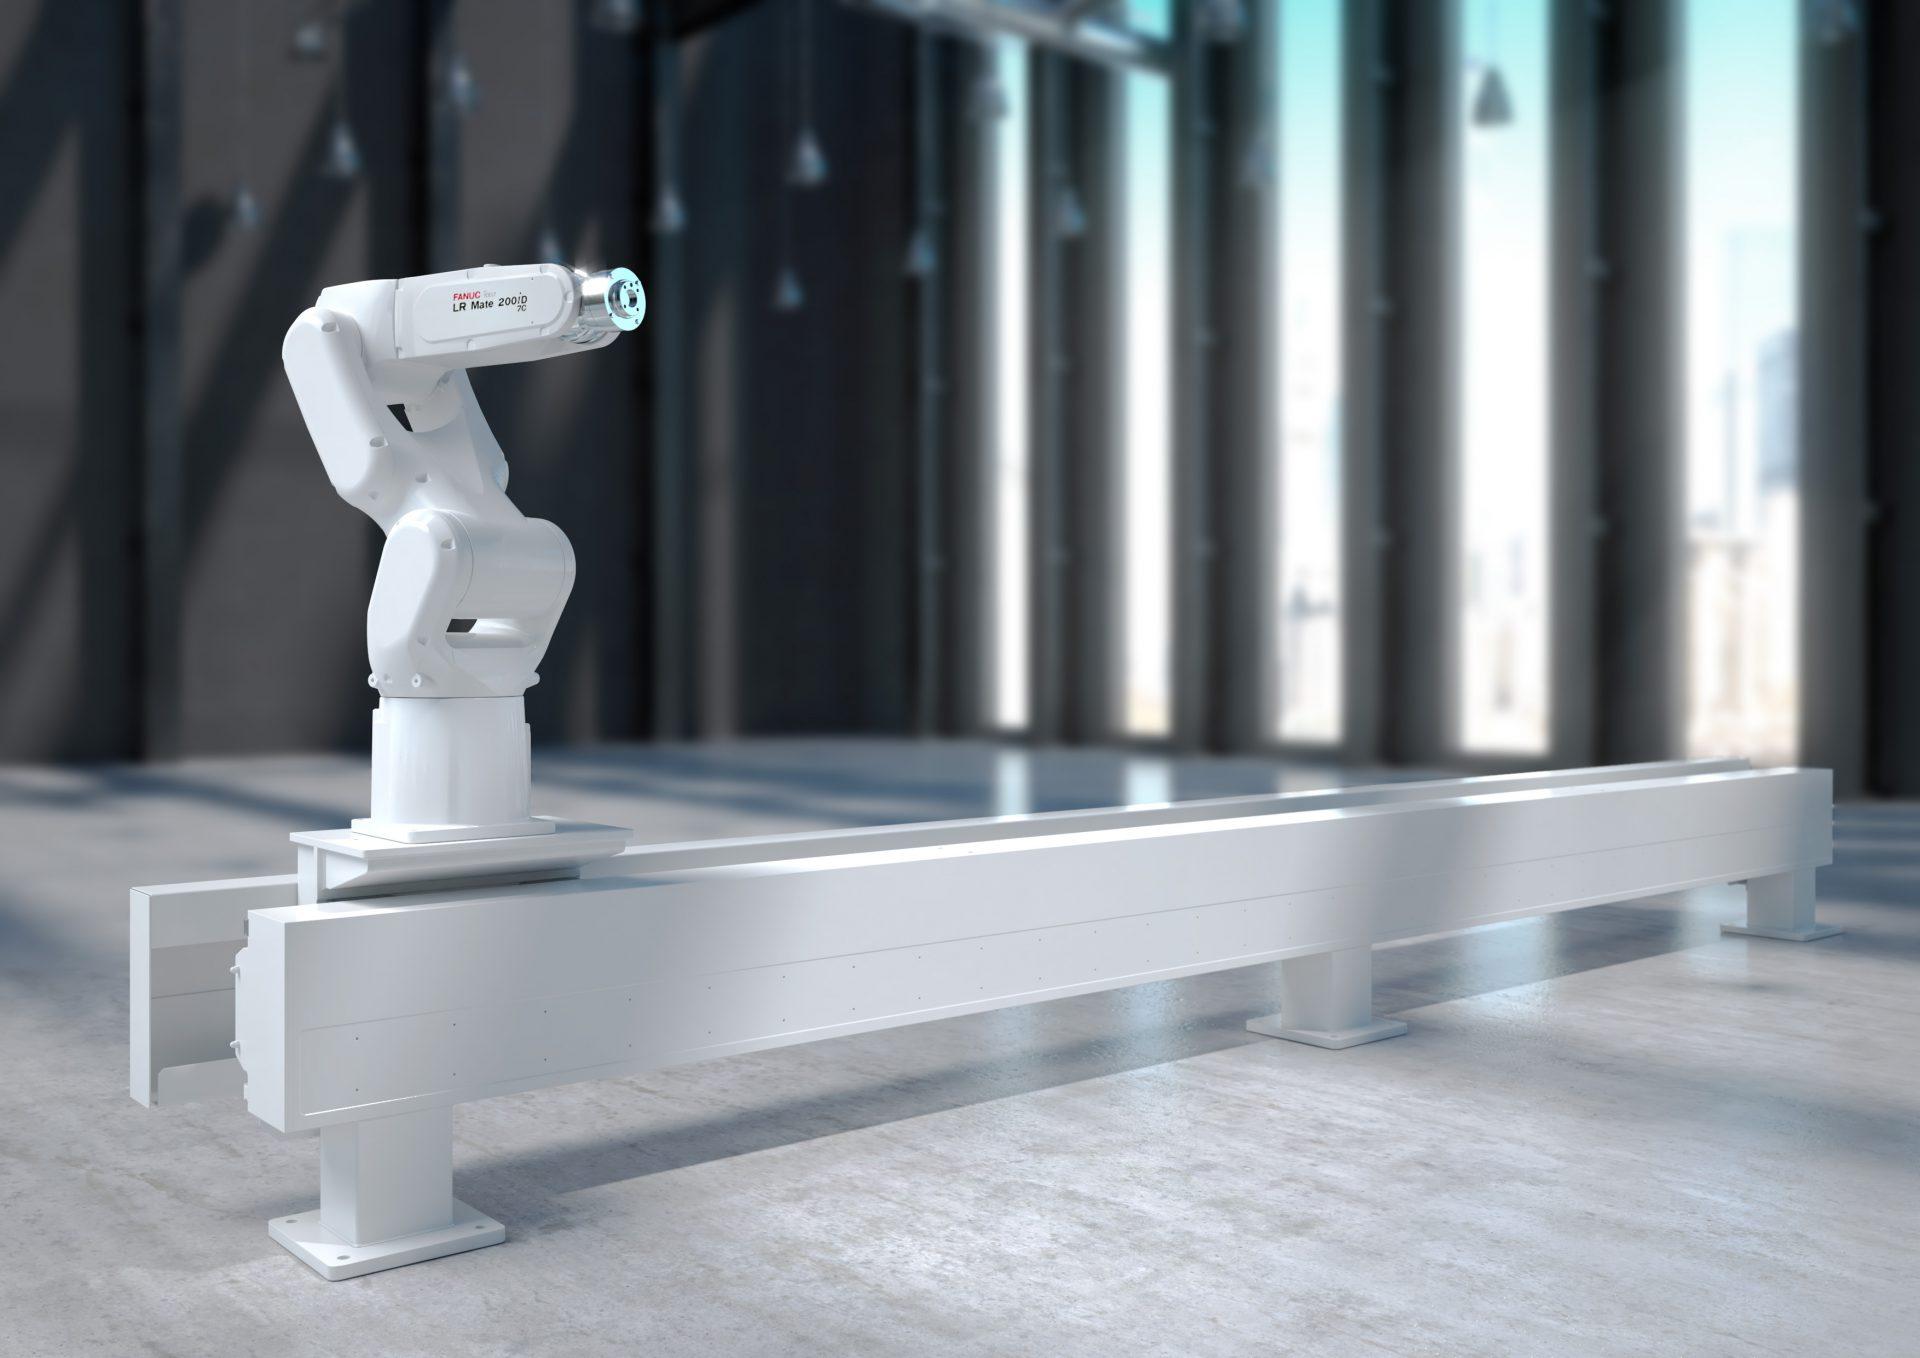 cleanroom iso6 robottrack